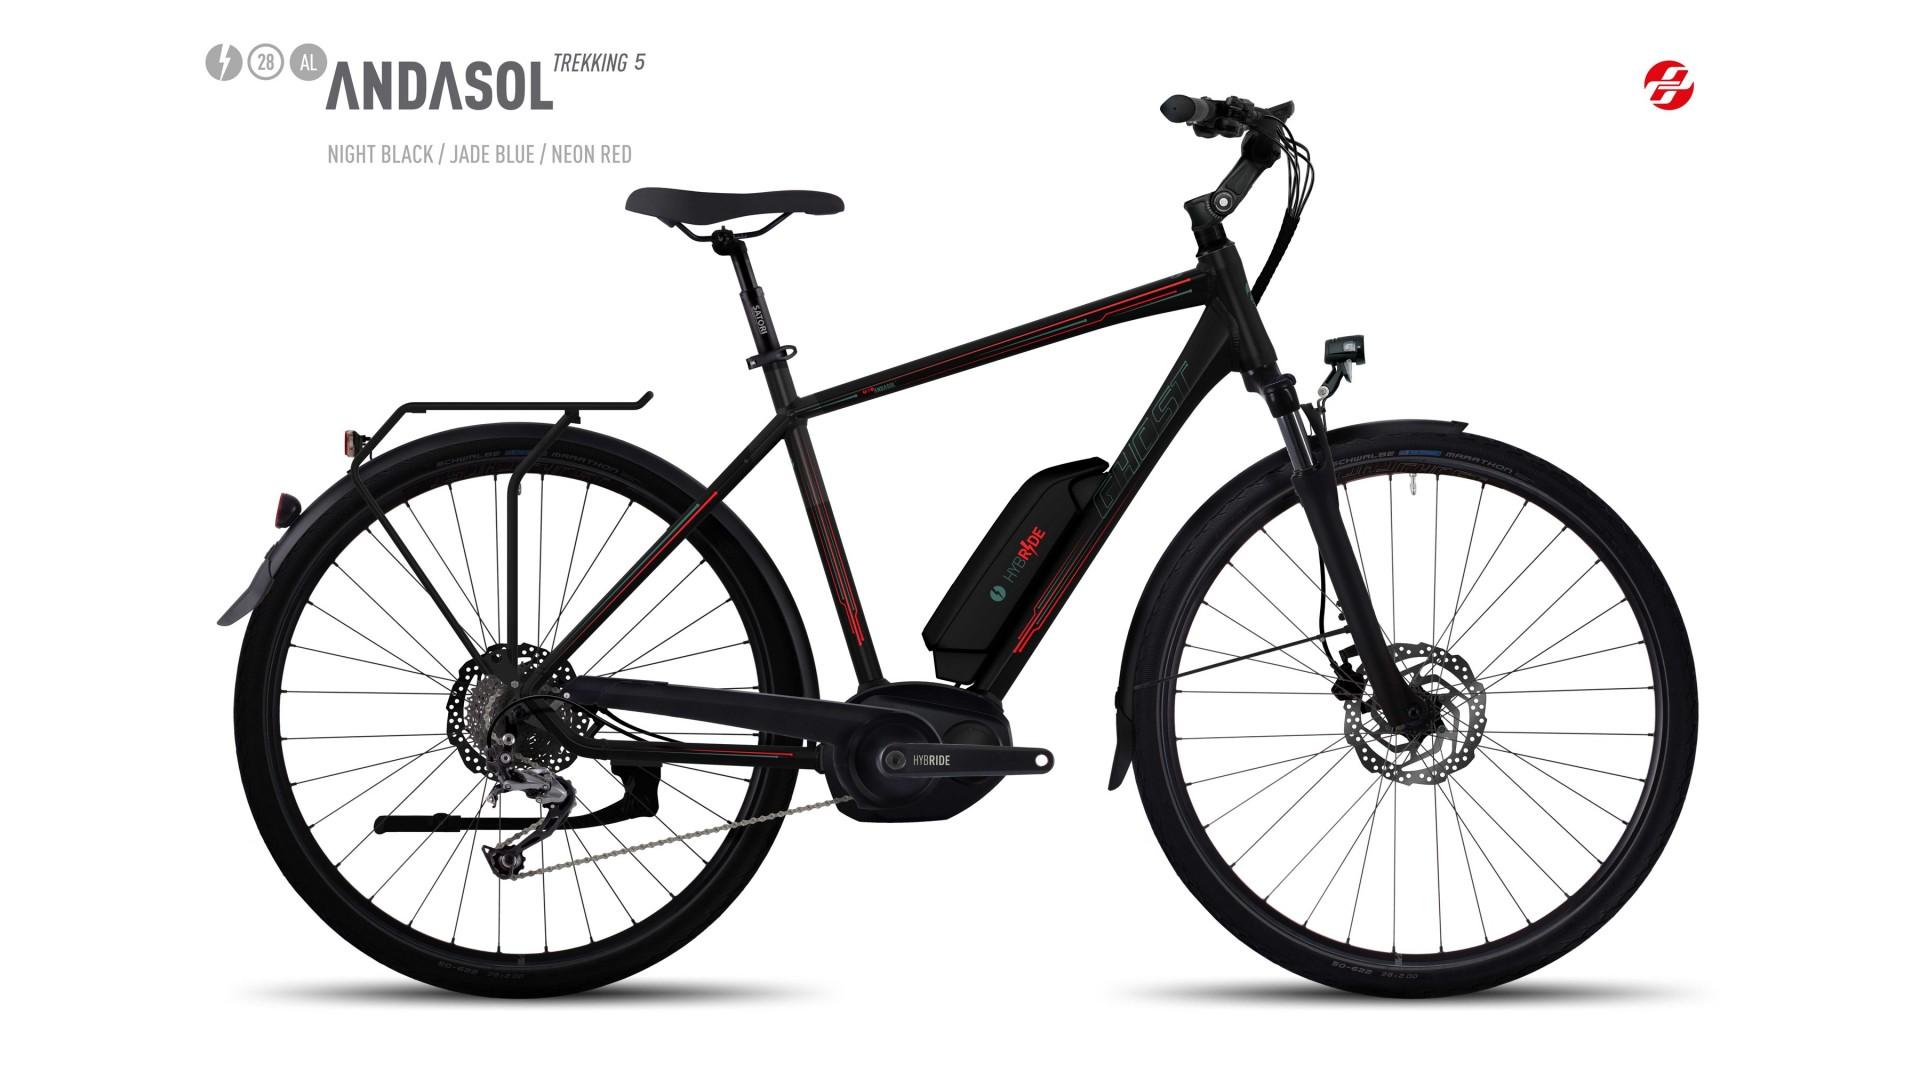 Электровелосипед GHOST Andasol Trekking 5 AL 28 nightblack/jadeblue/neonred год 2017